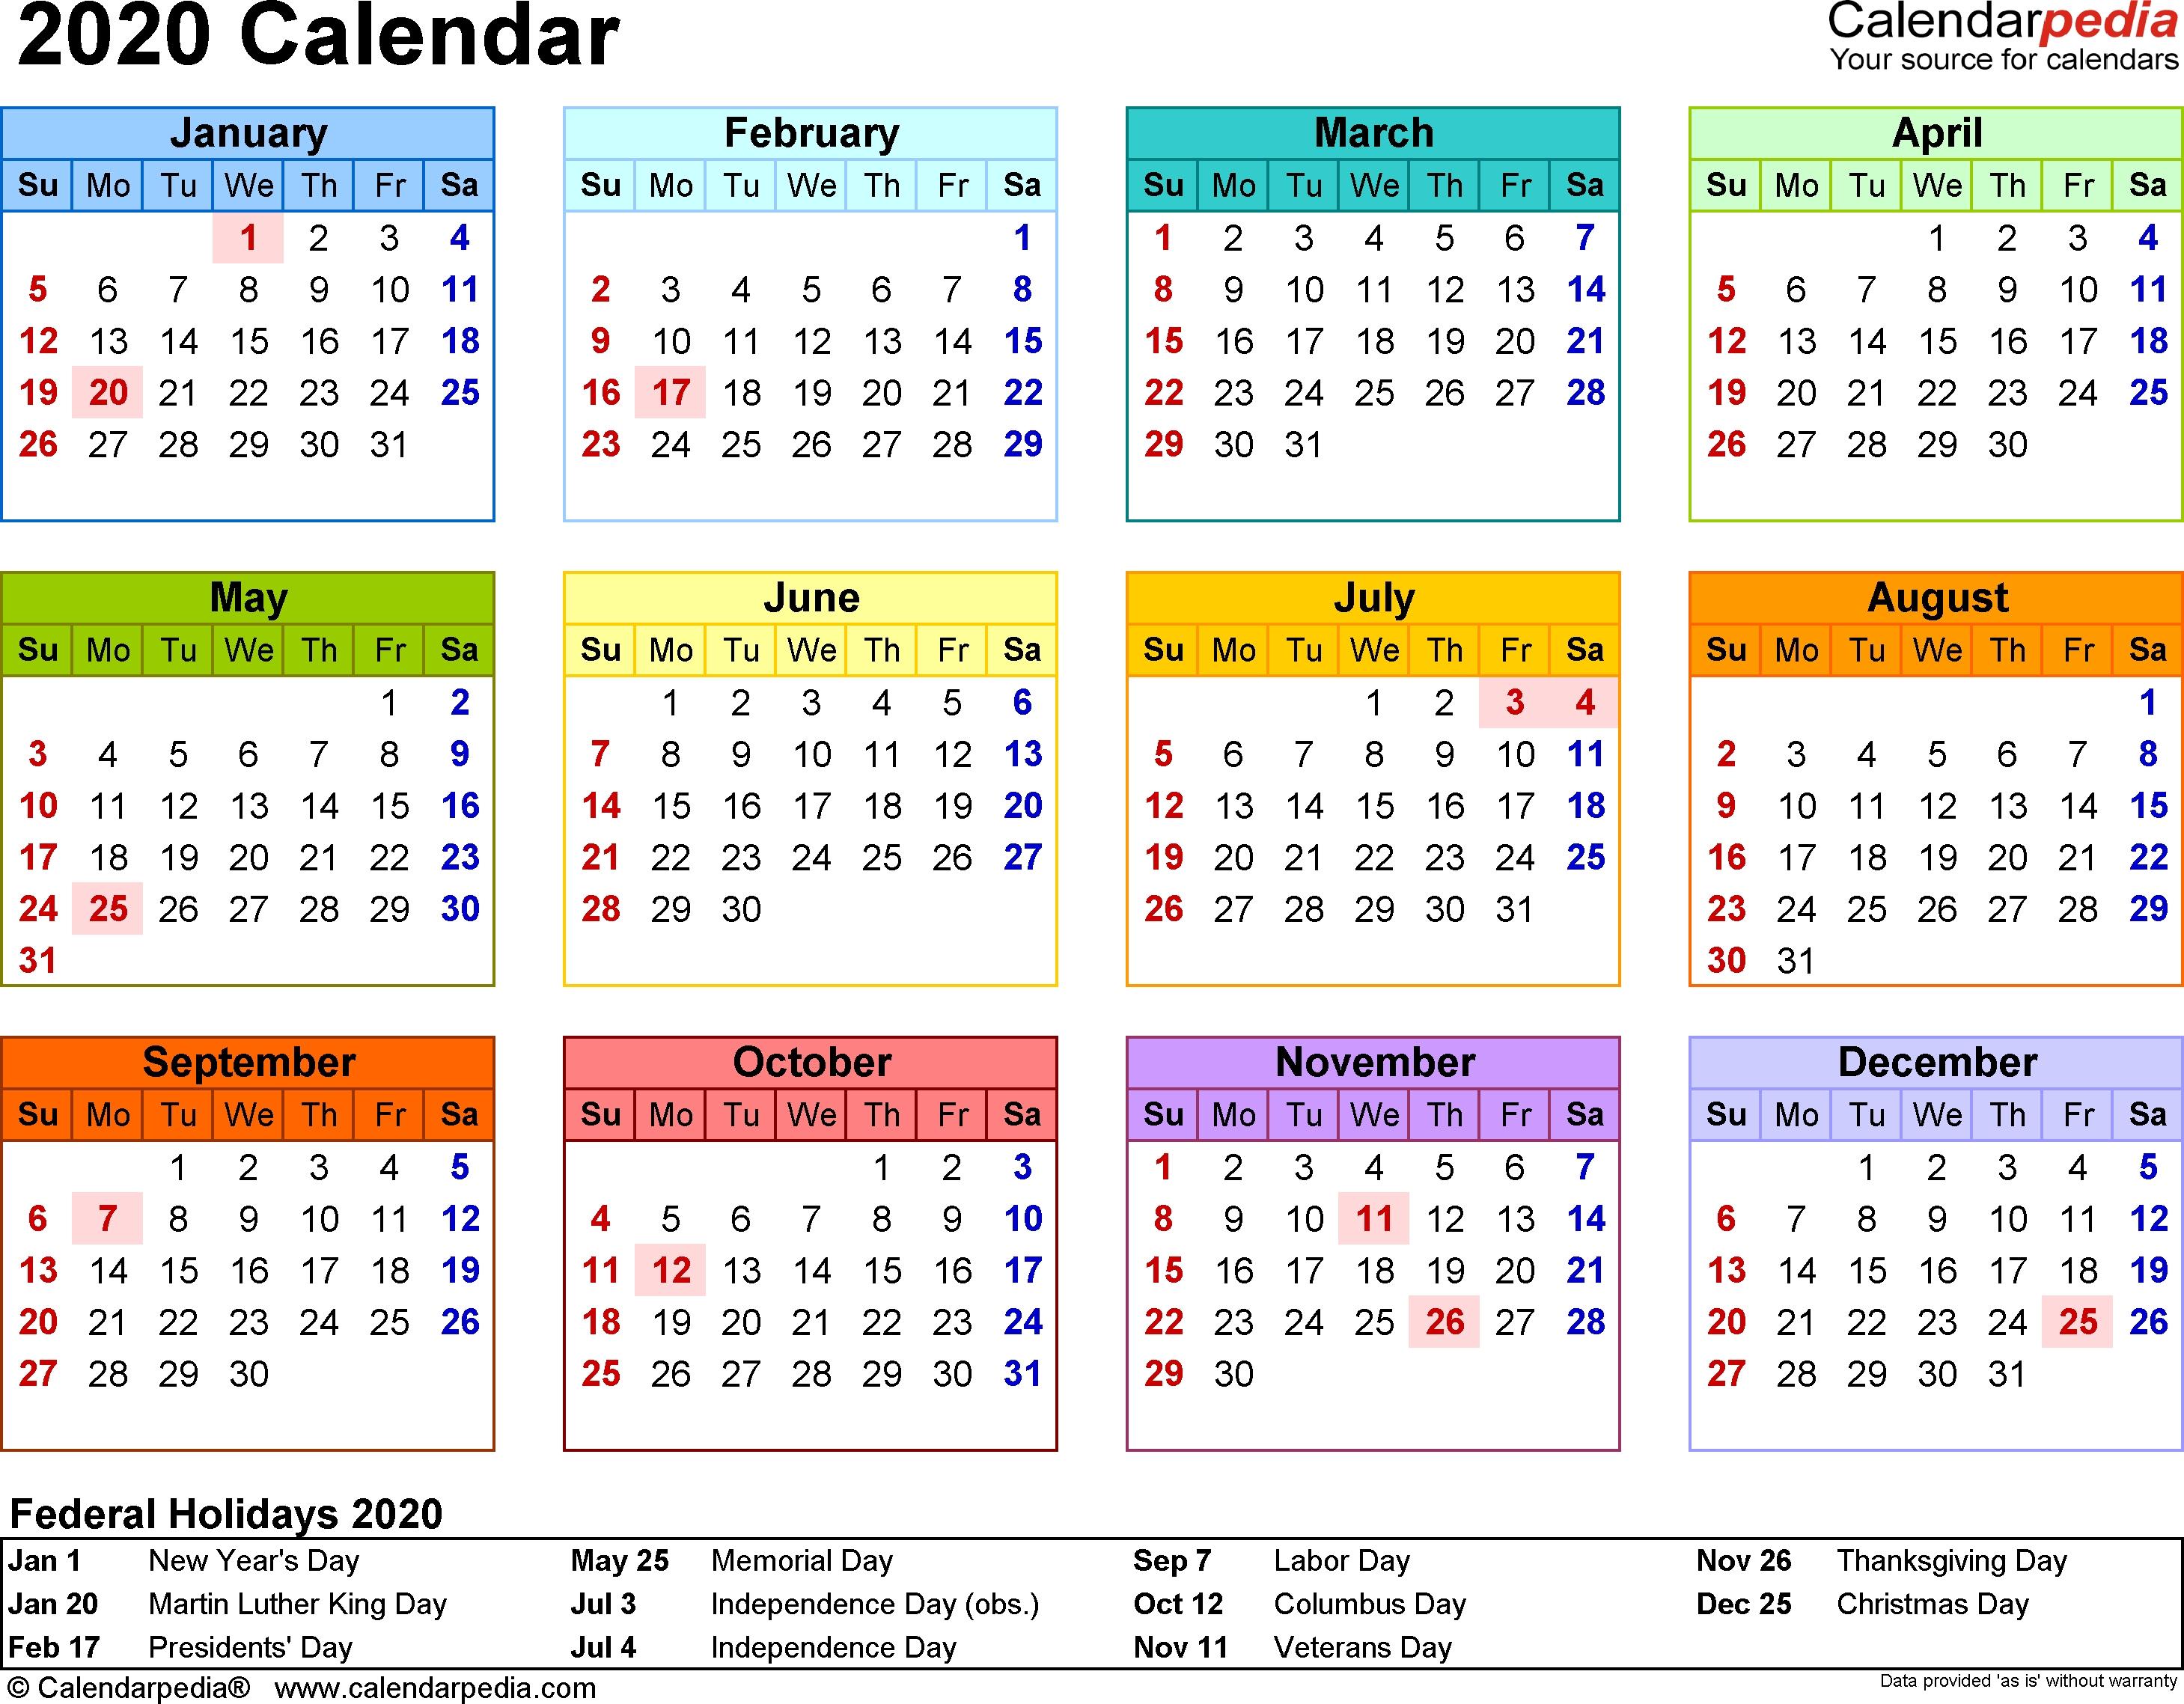 2020 Calendar - Free Printable Microsoft Word Templates throughout At A Glance Downloadable 2020 Calendar